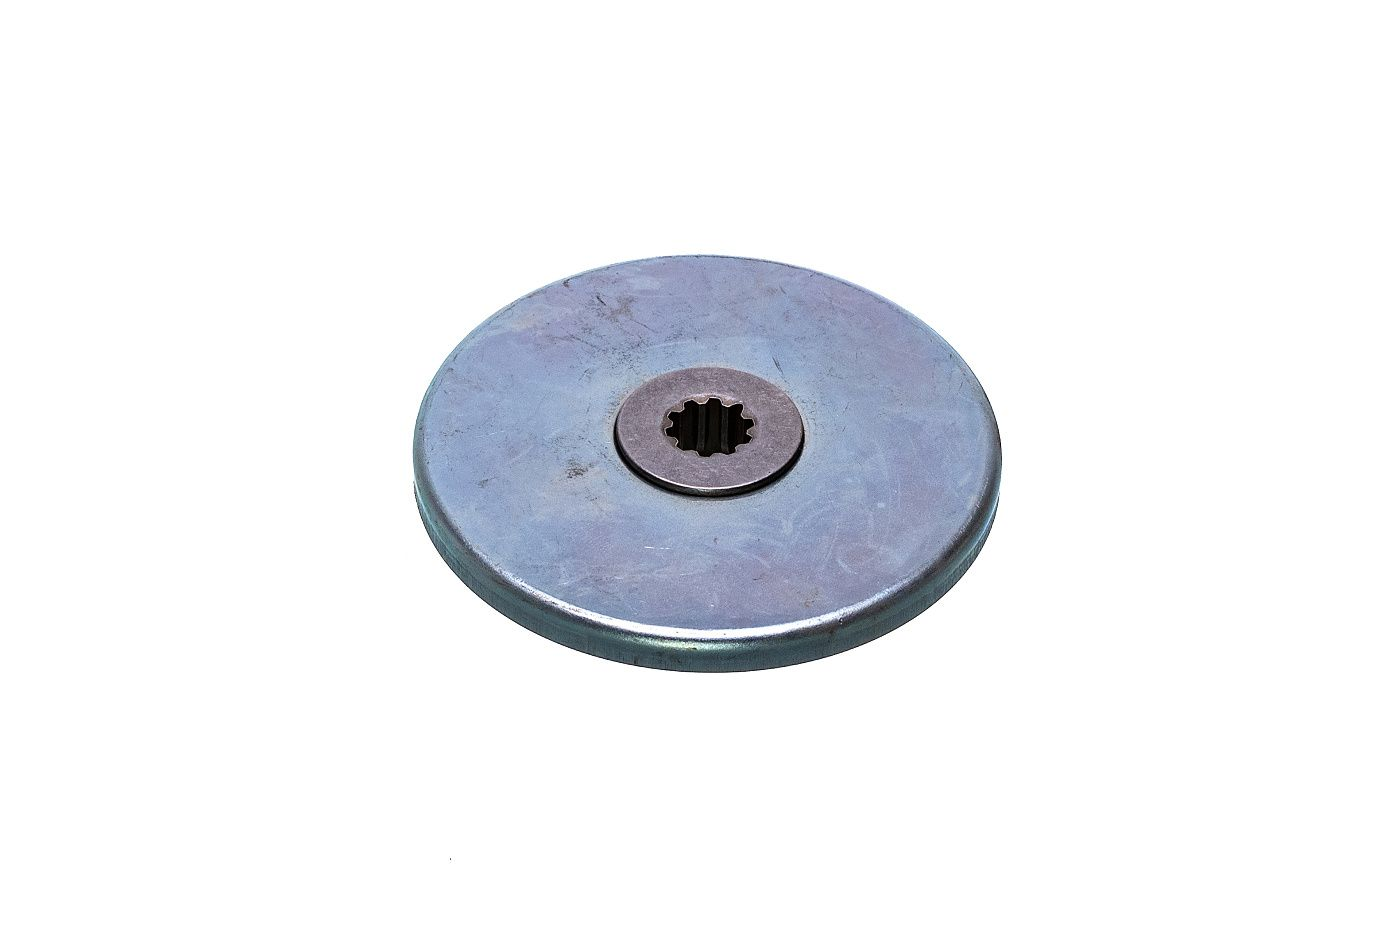 Podporná miska Stihl FS36 FS44 FS60 FS80 FS110 FS120 FS130 FS200